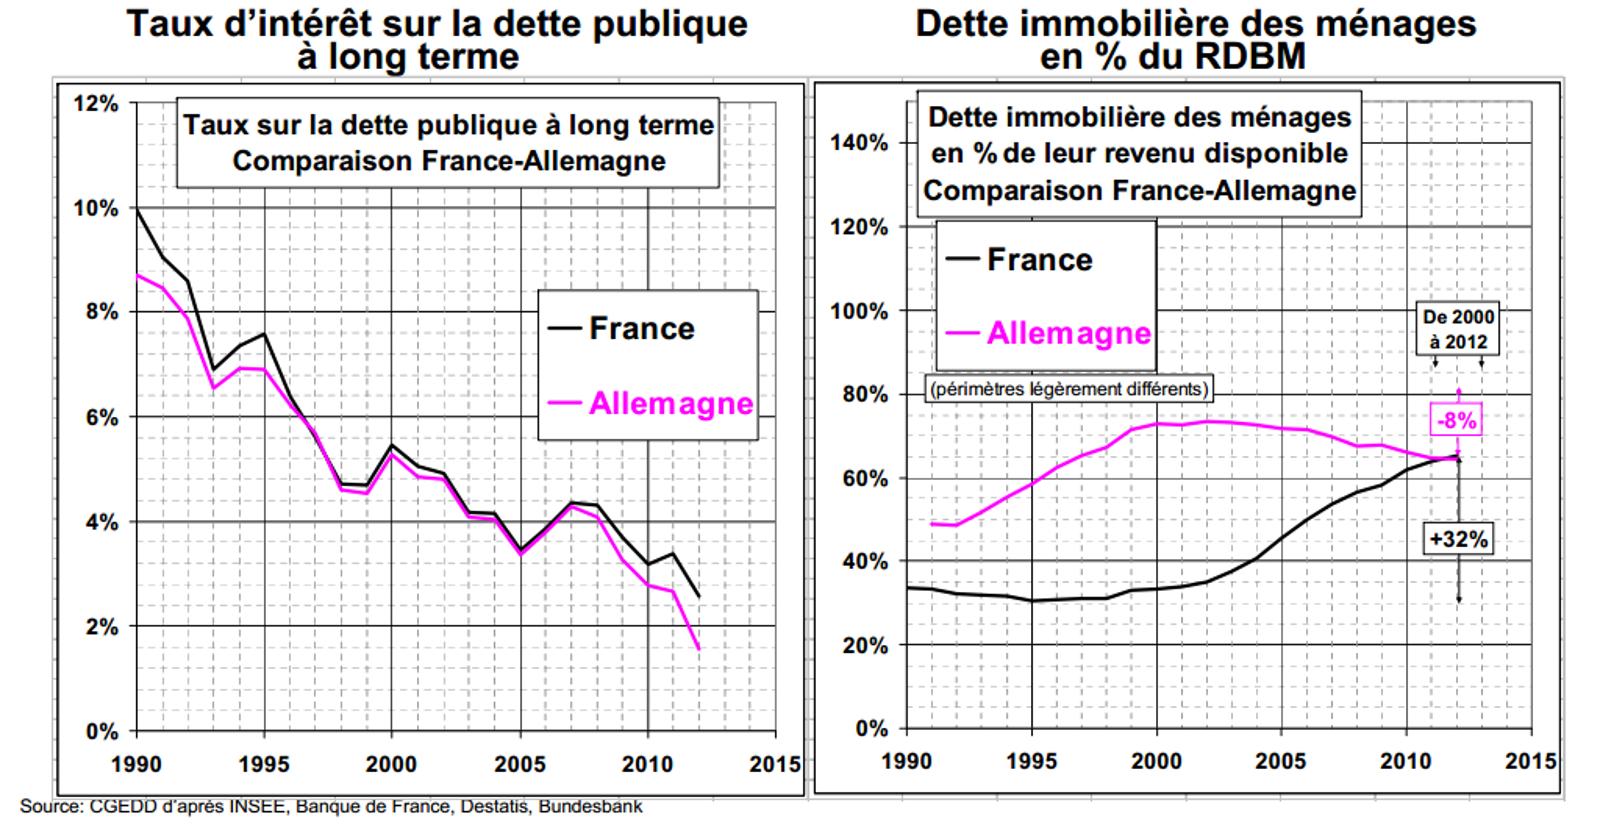 Dette immobiliere des menages en France et en Allemagne